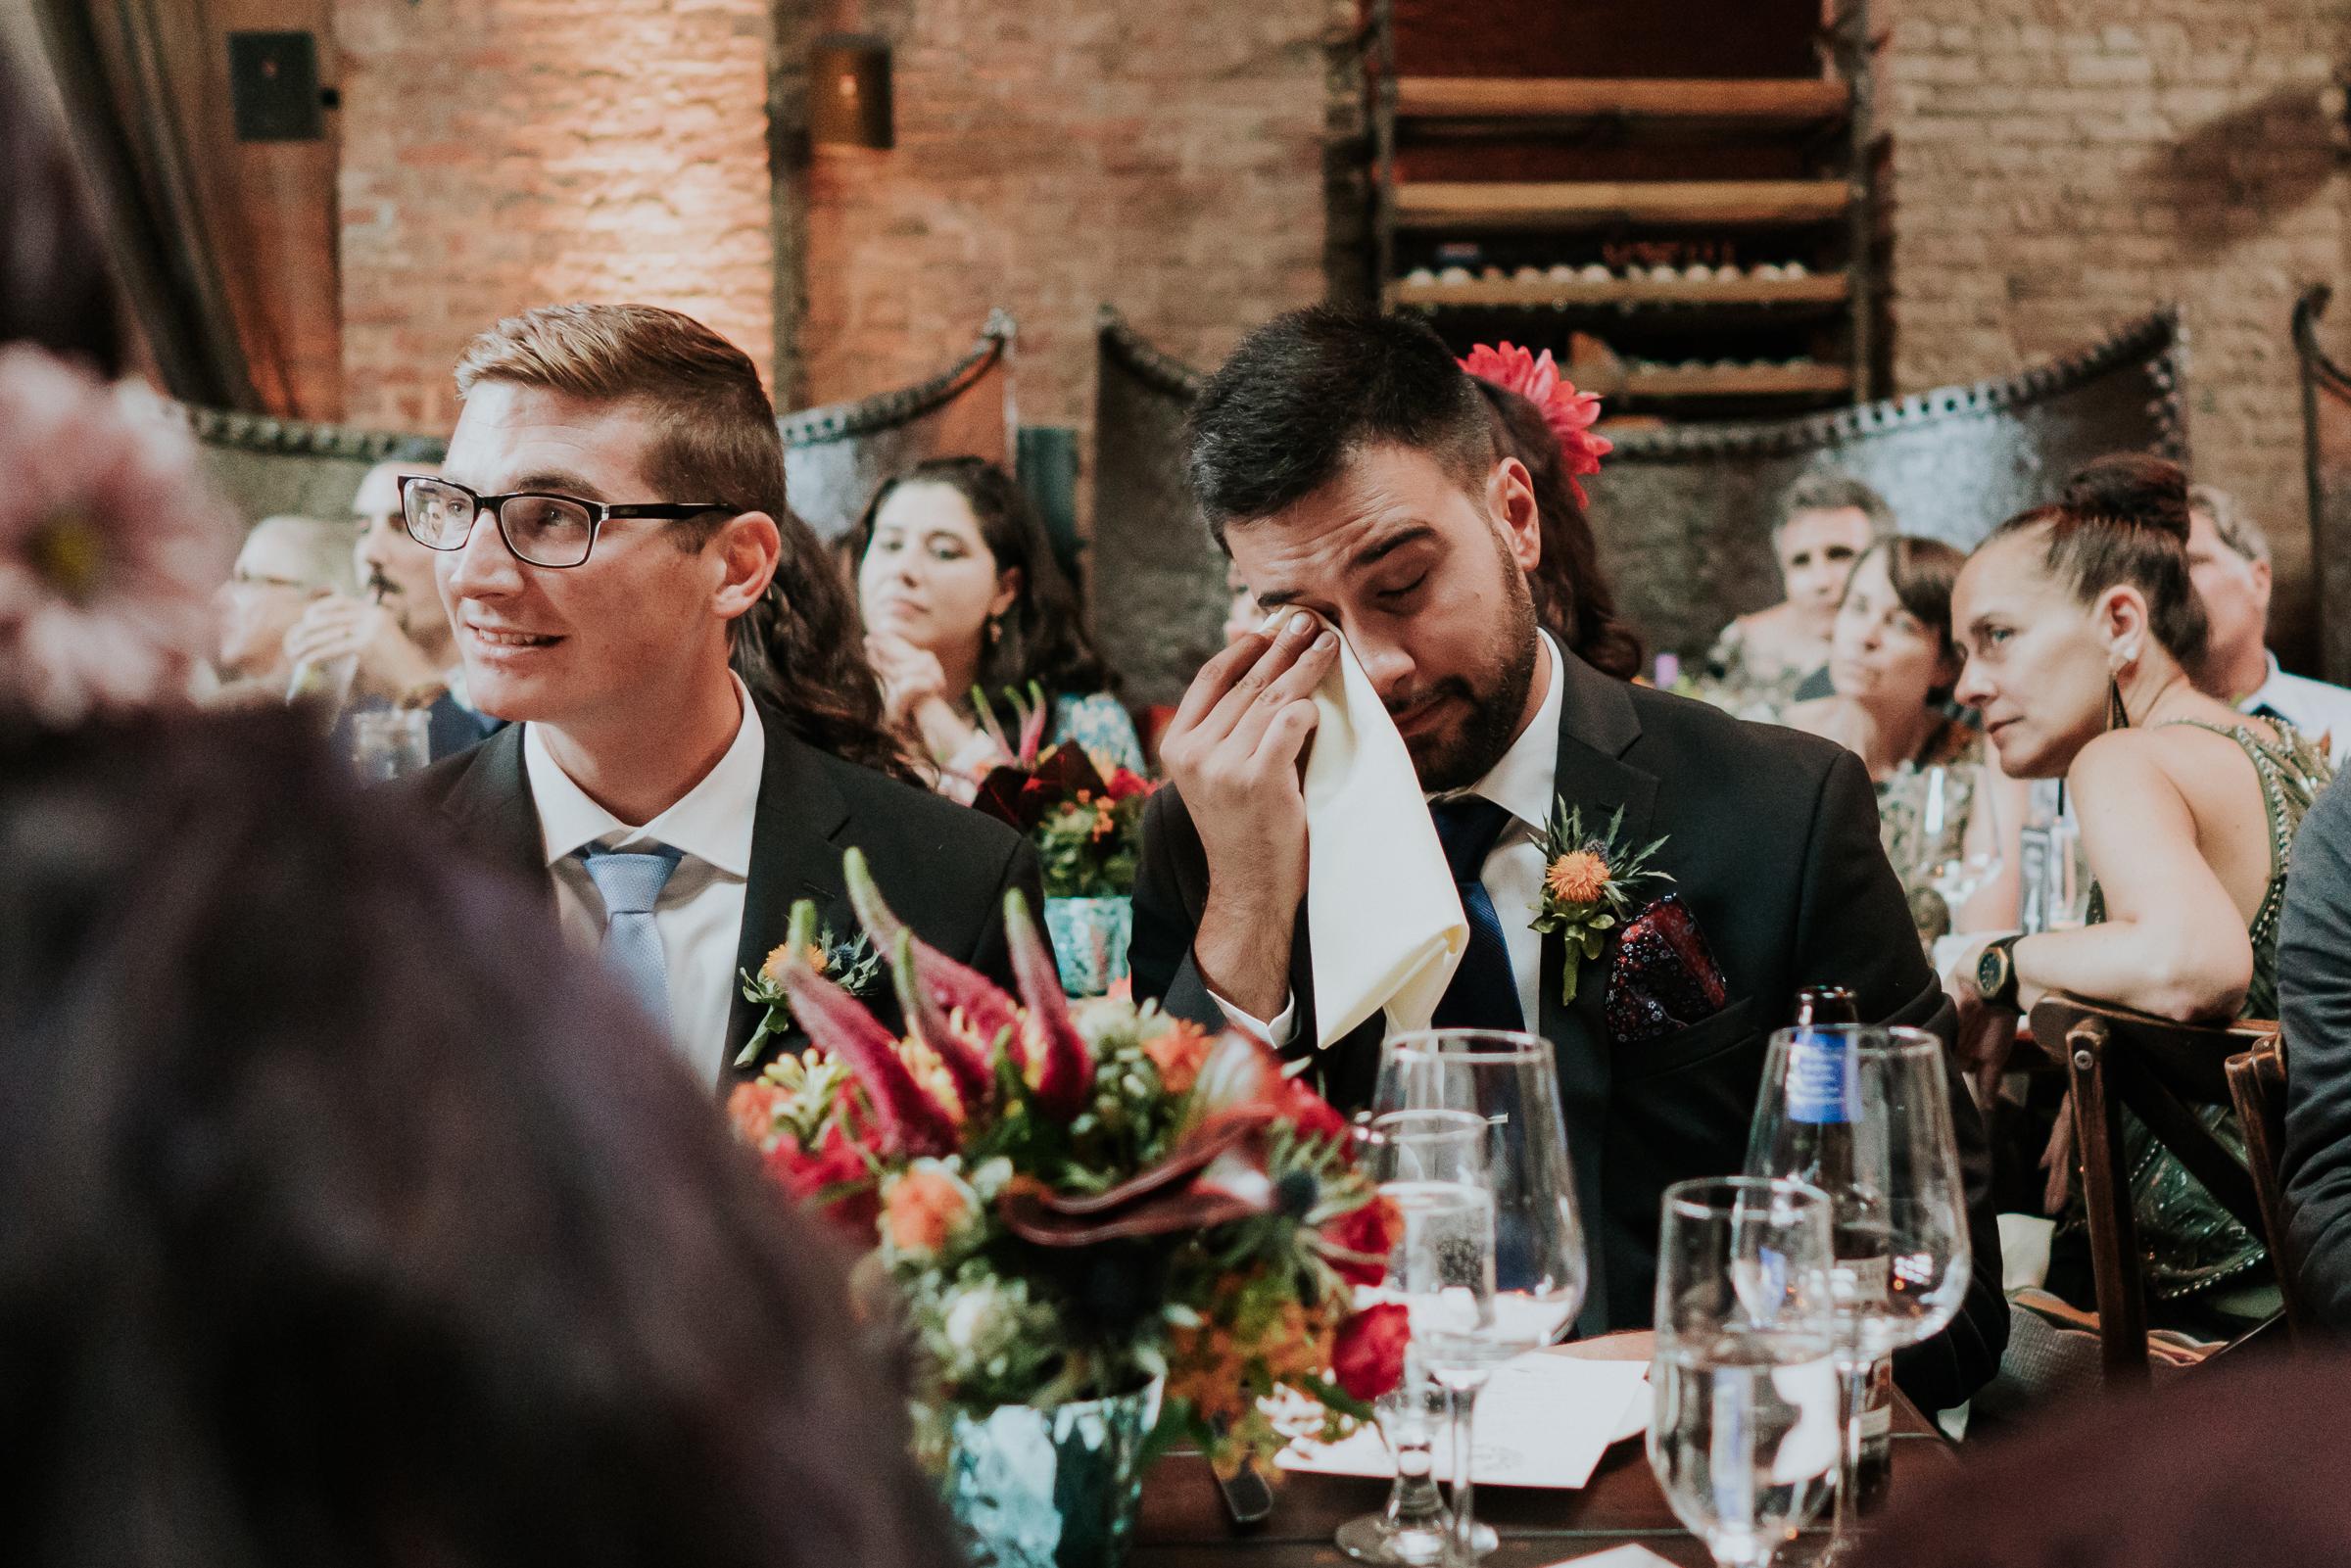 My-Moon-Brooklyn-LGBT-Gay-Documentary-Wedding-Photographer-90.jpg